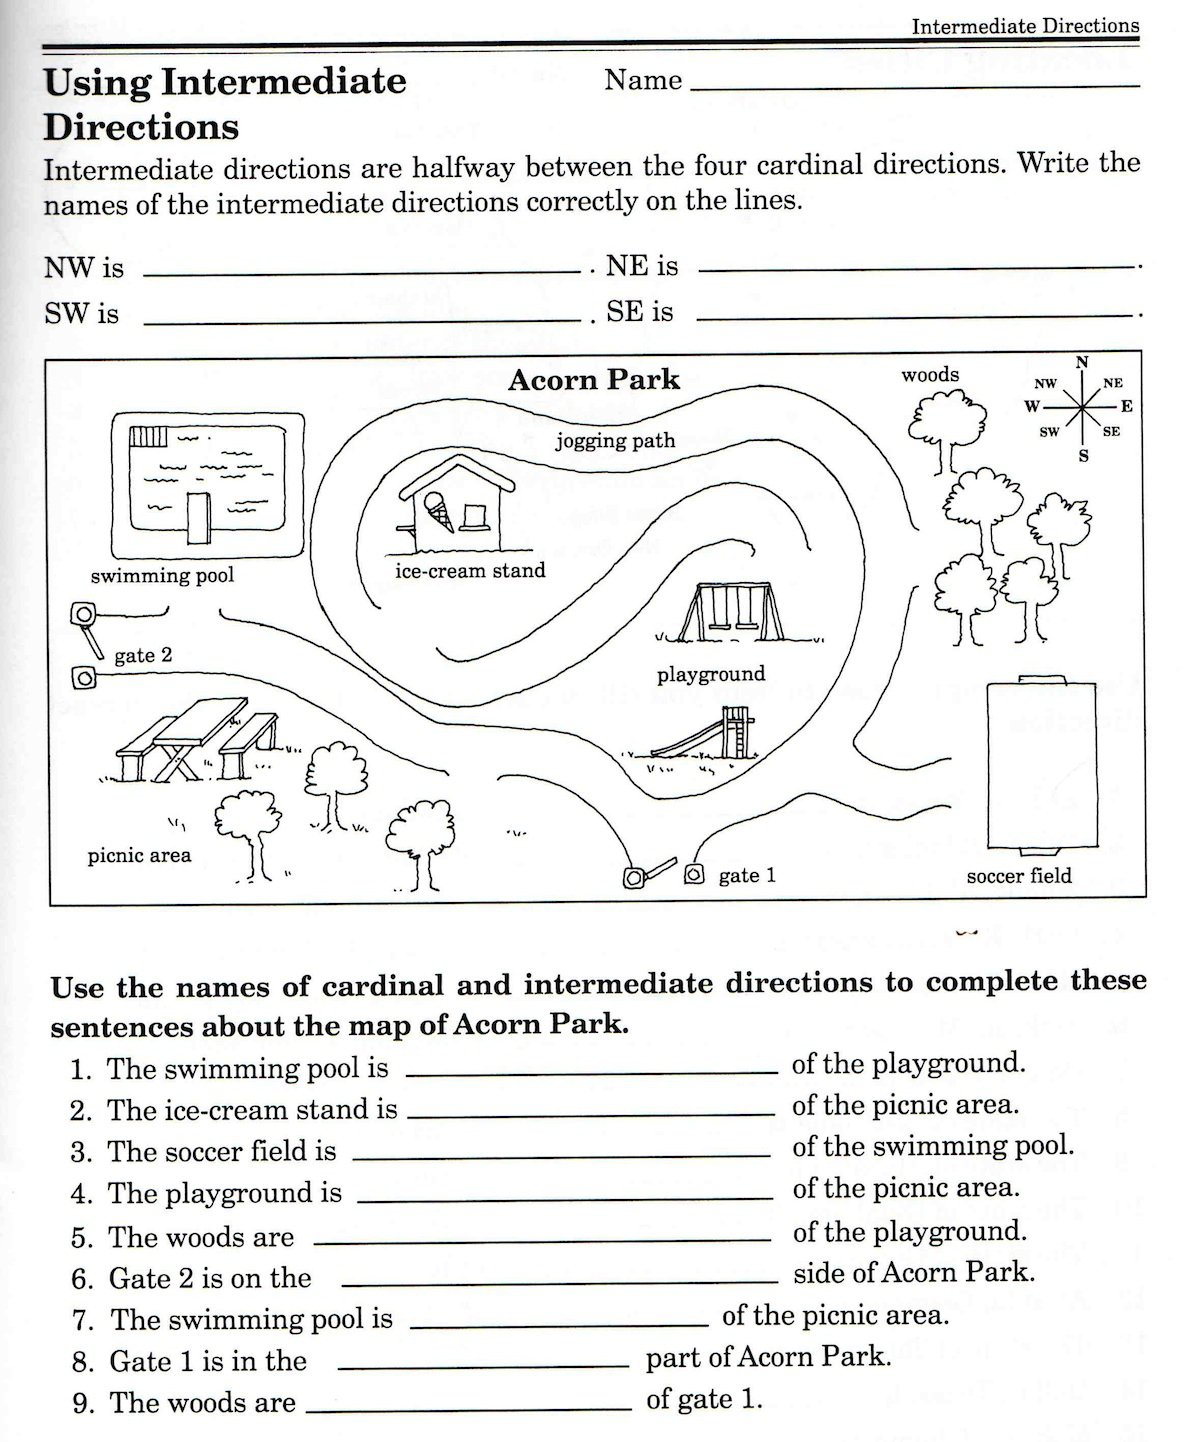 Intermediate Directions Worksheets